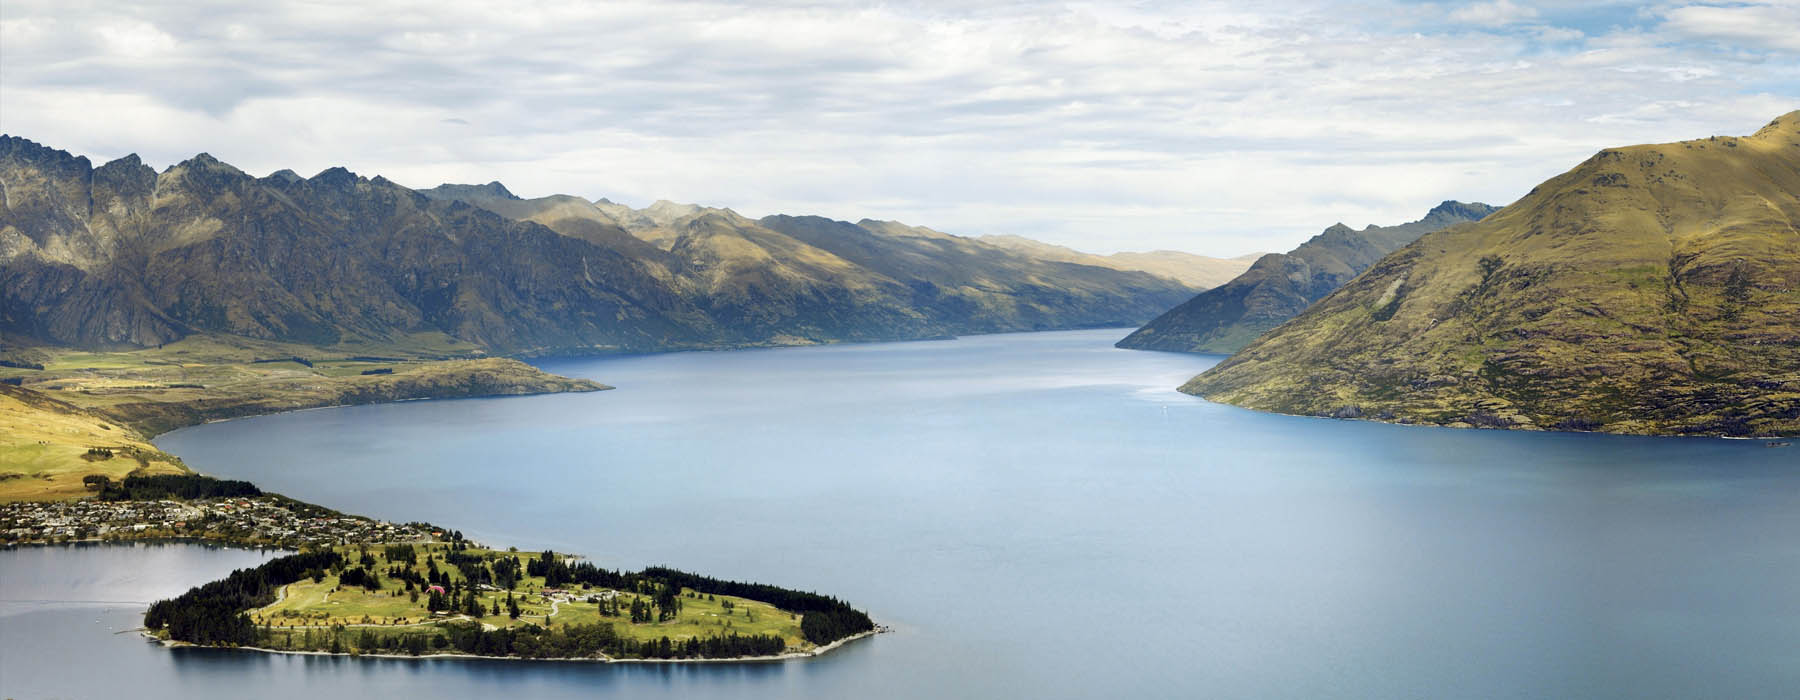 site de rencontres en NZ Susan Blakely datant